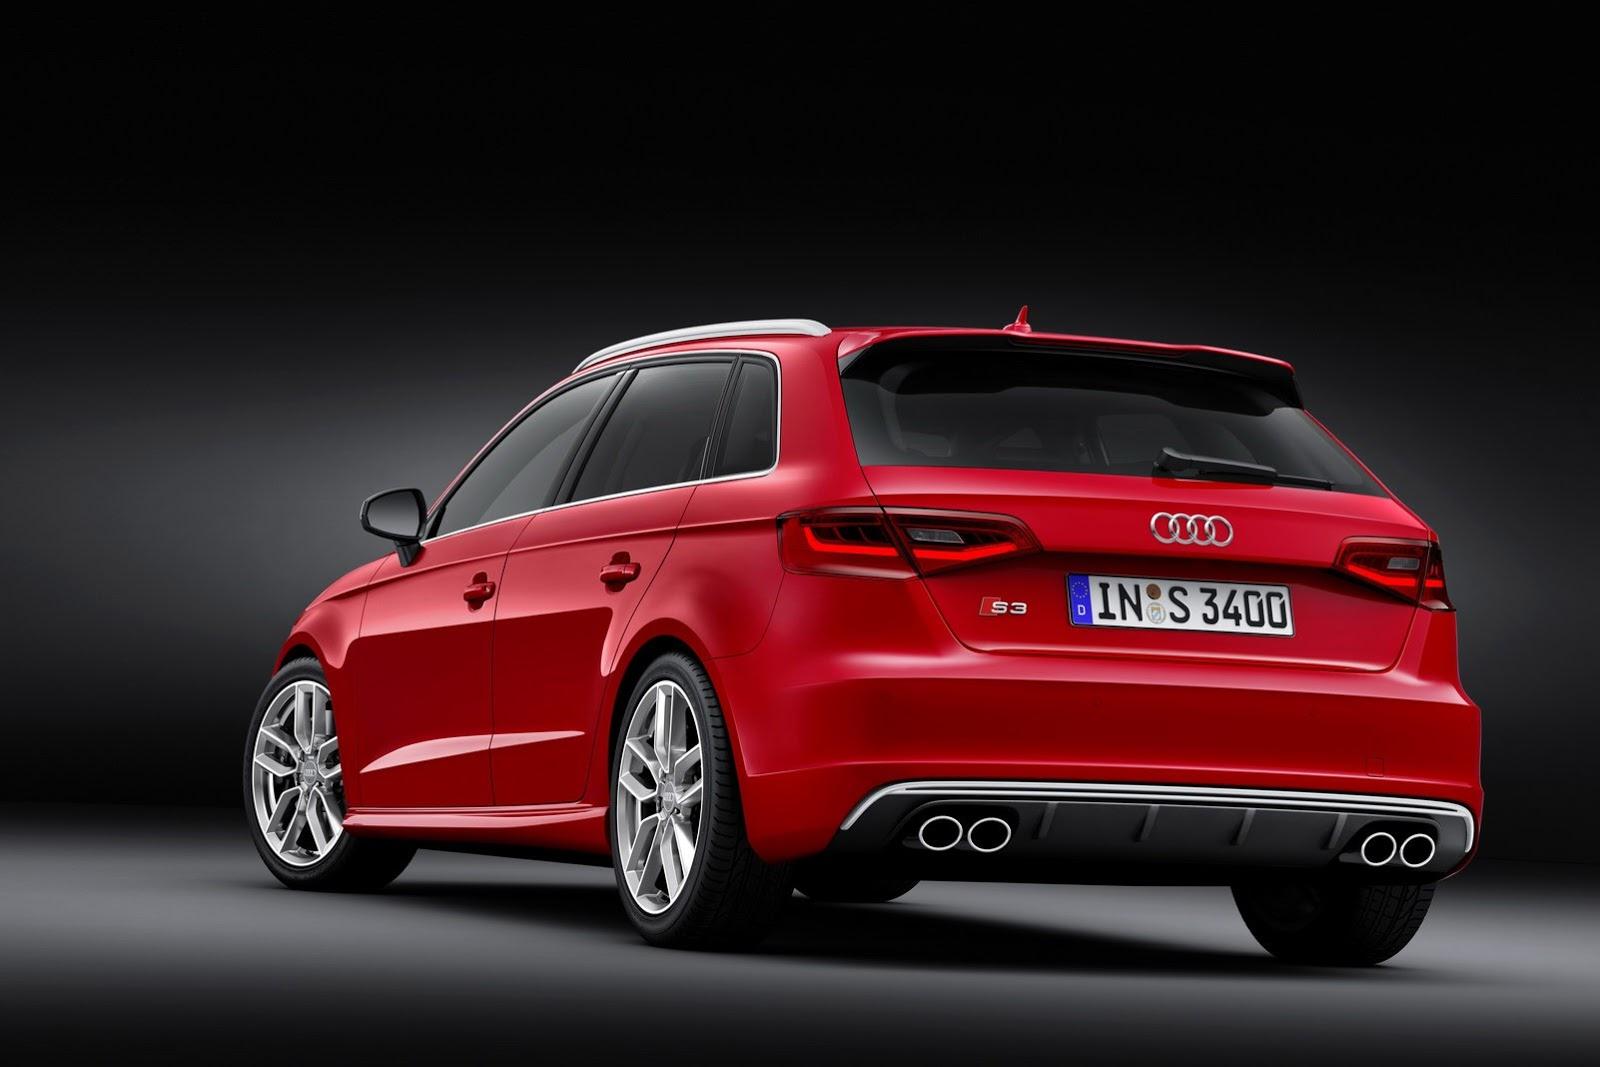 Audi-S3-Sportback-2%5B2%5D.jpg